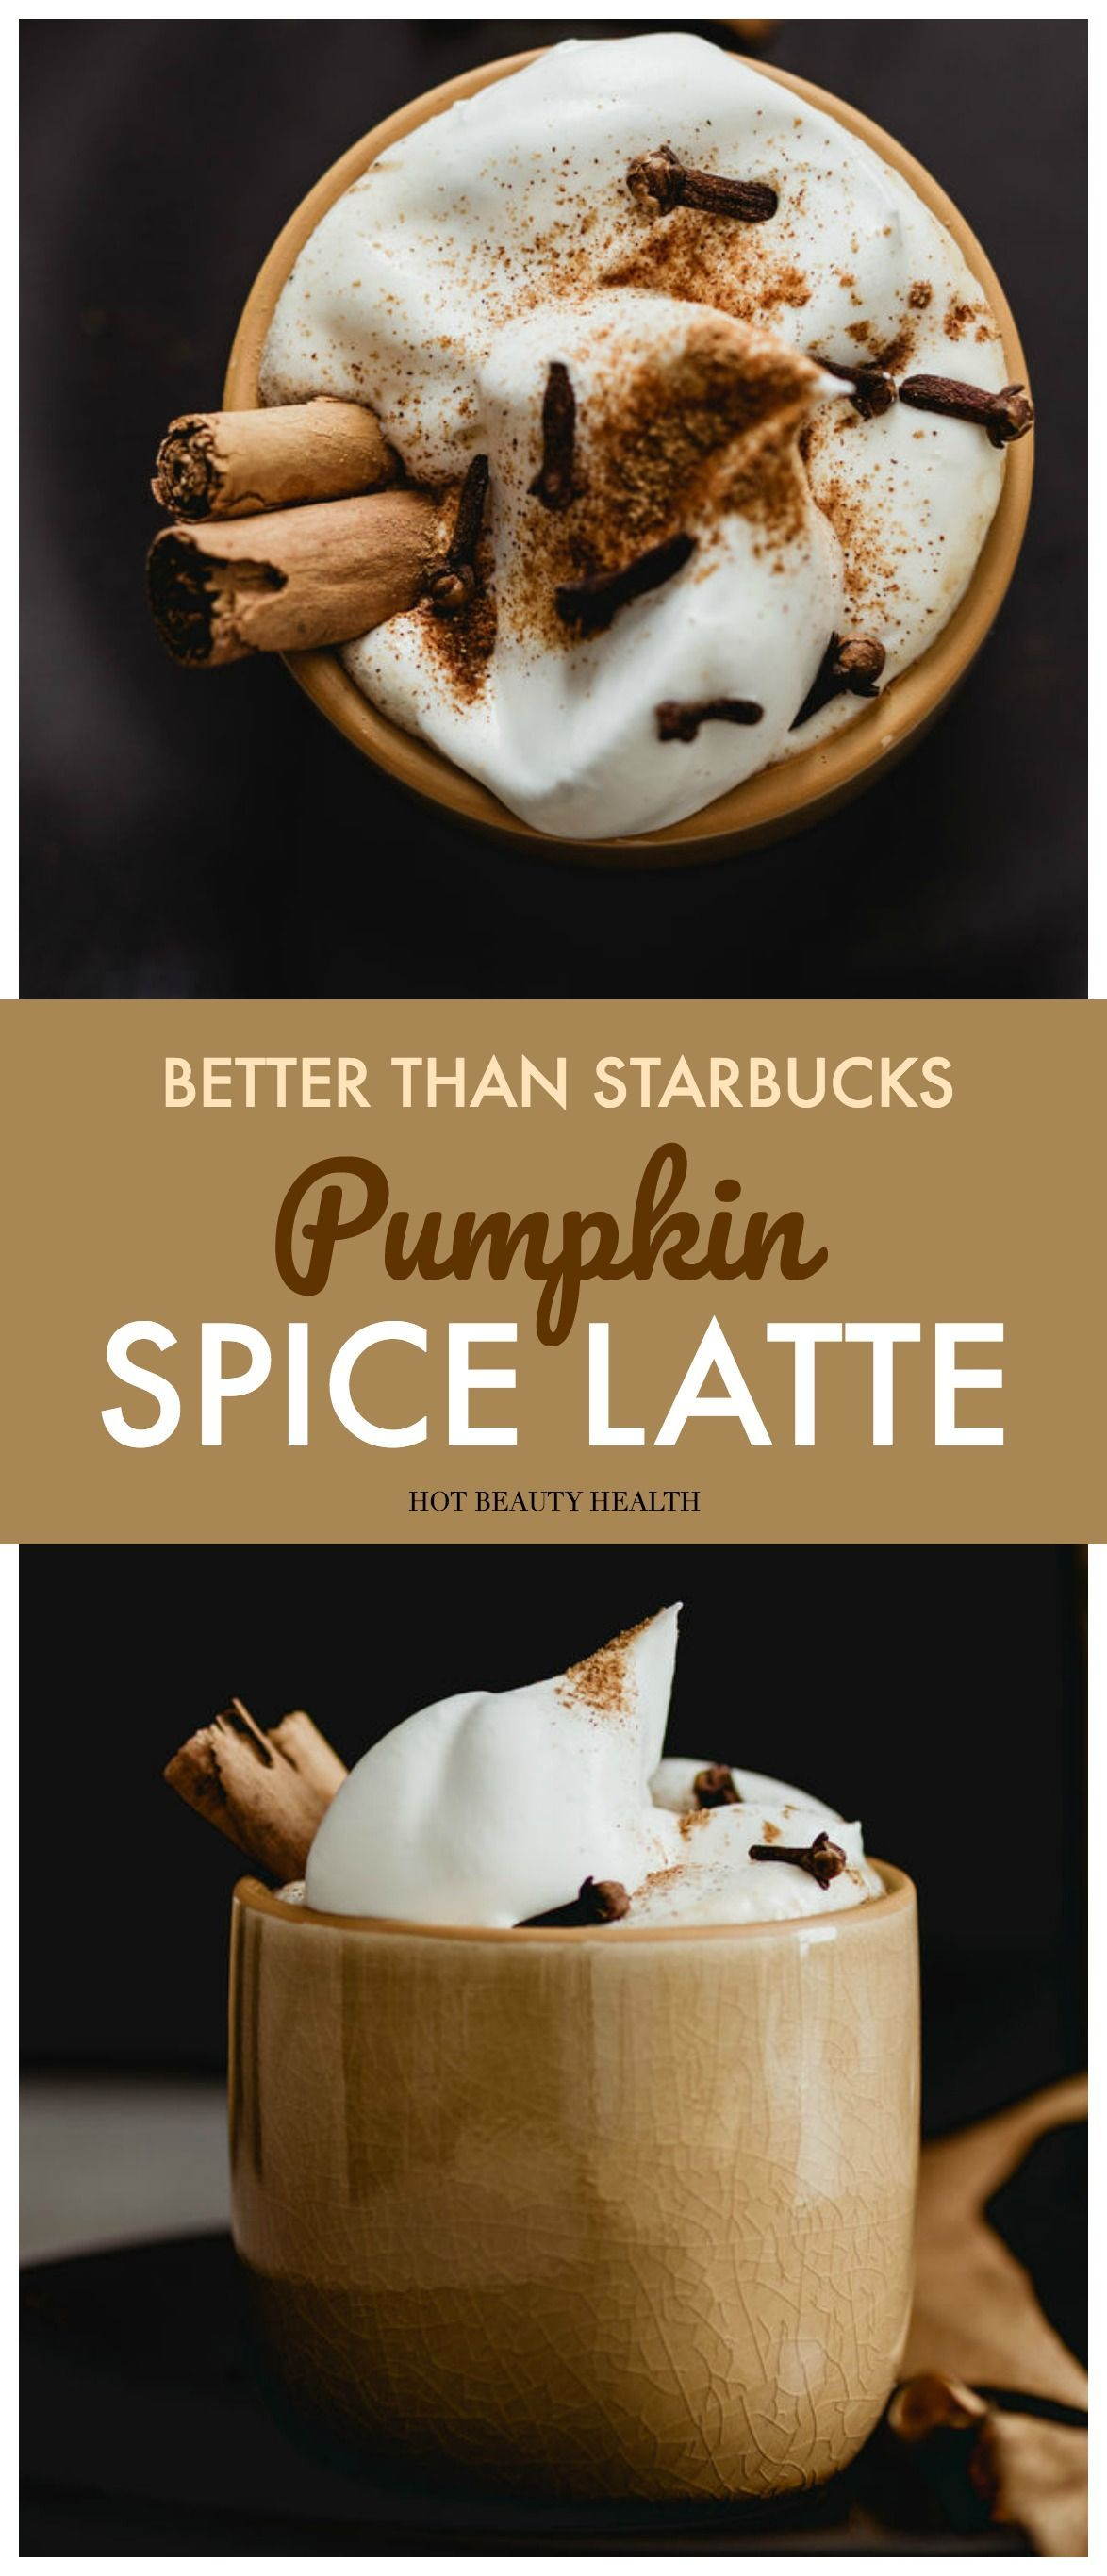 Homemade Pumpkin Spice Latte Recipe - Hot Beauty Health